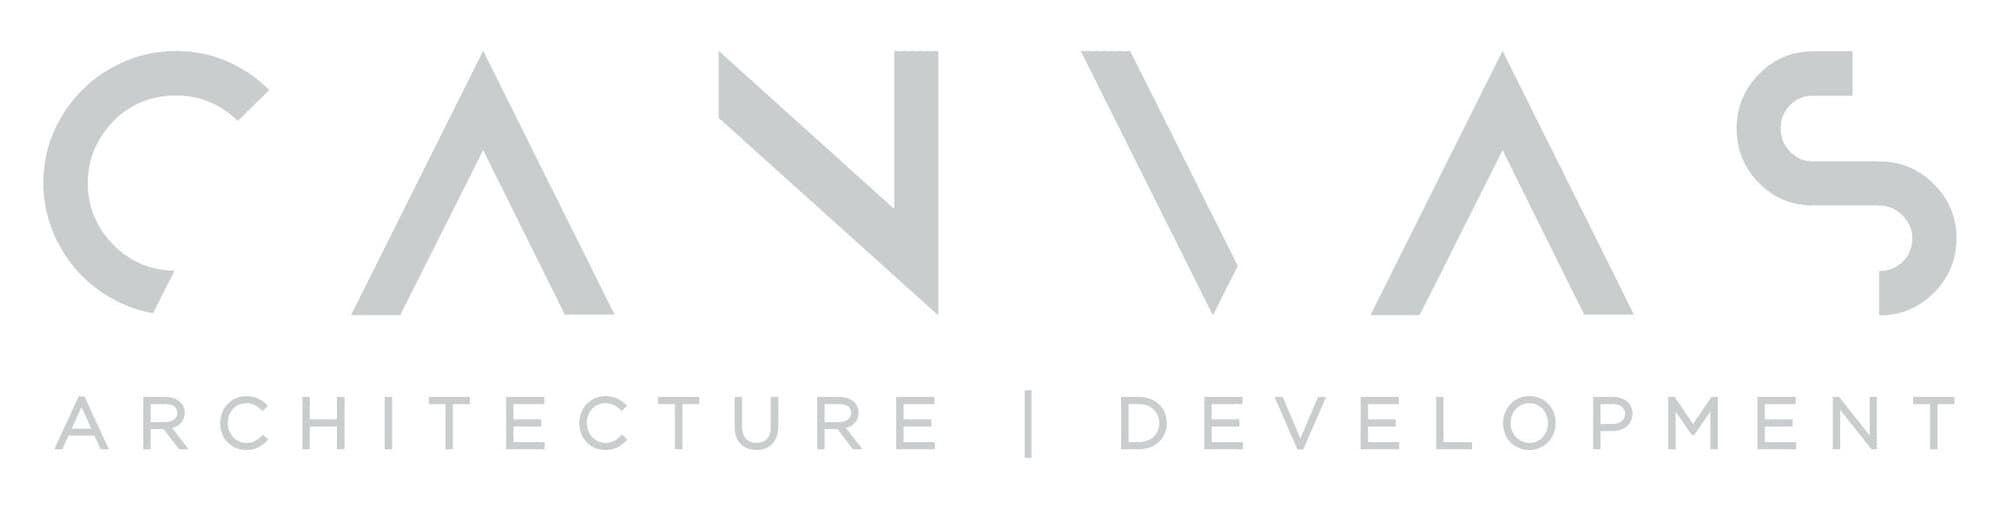 CANVAS Architecture | Development